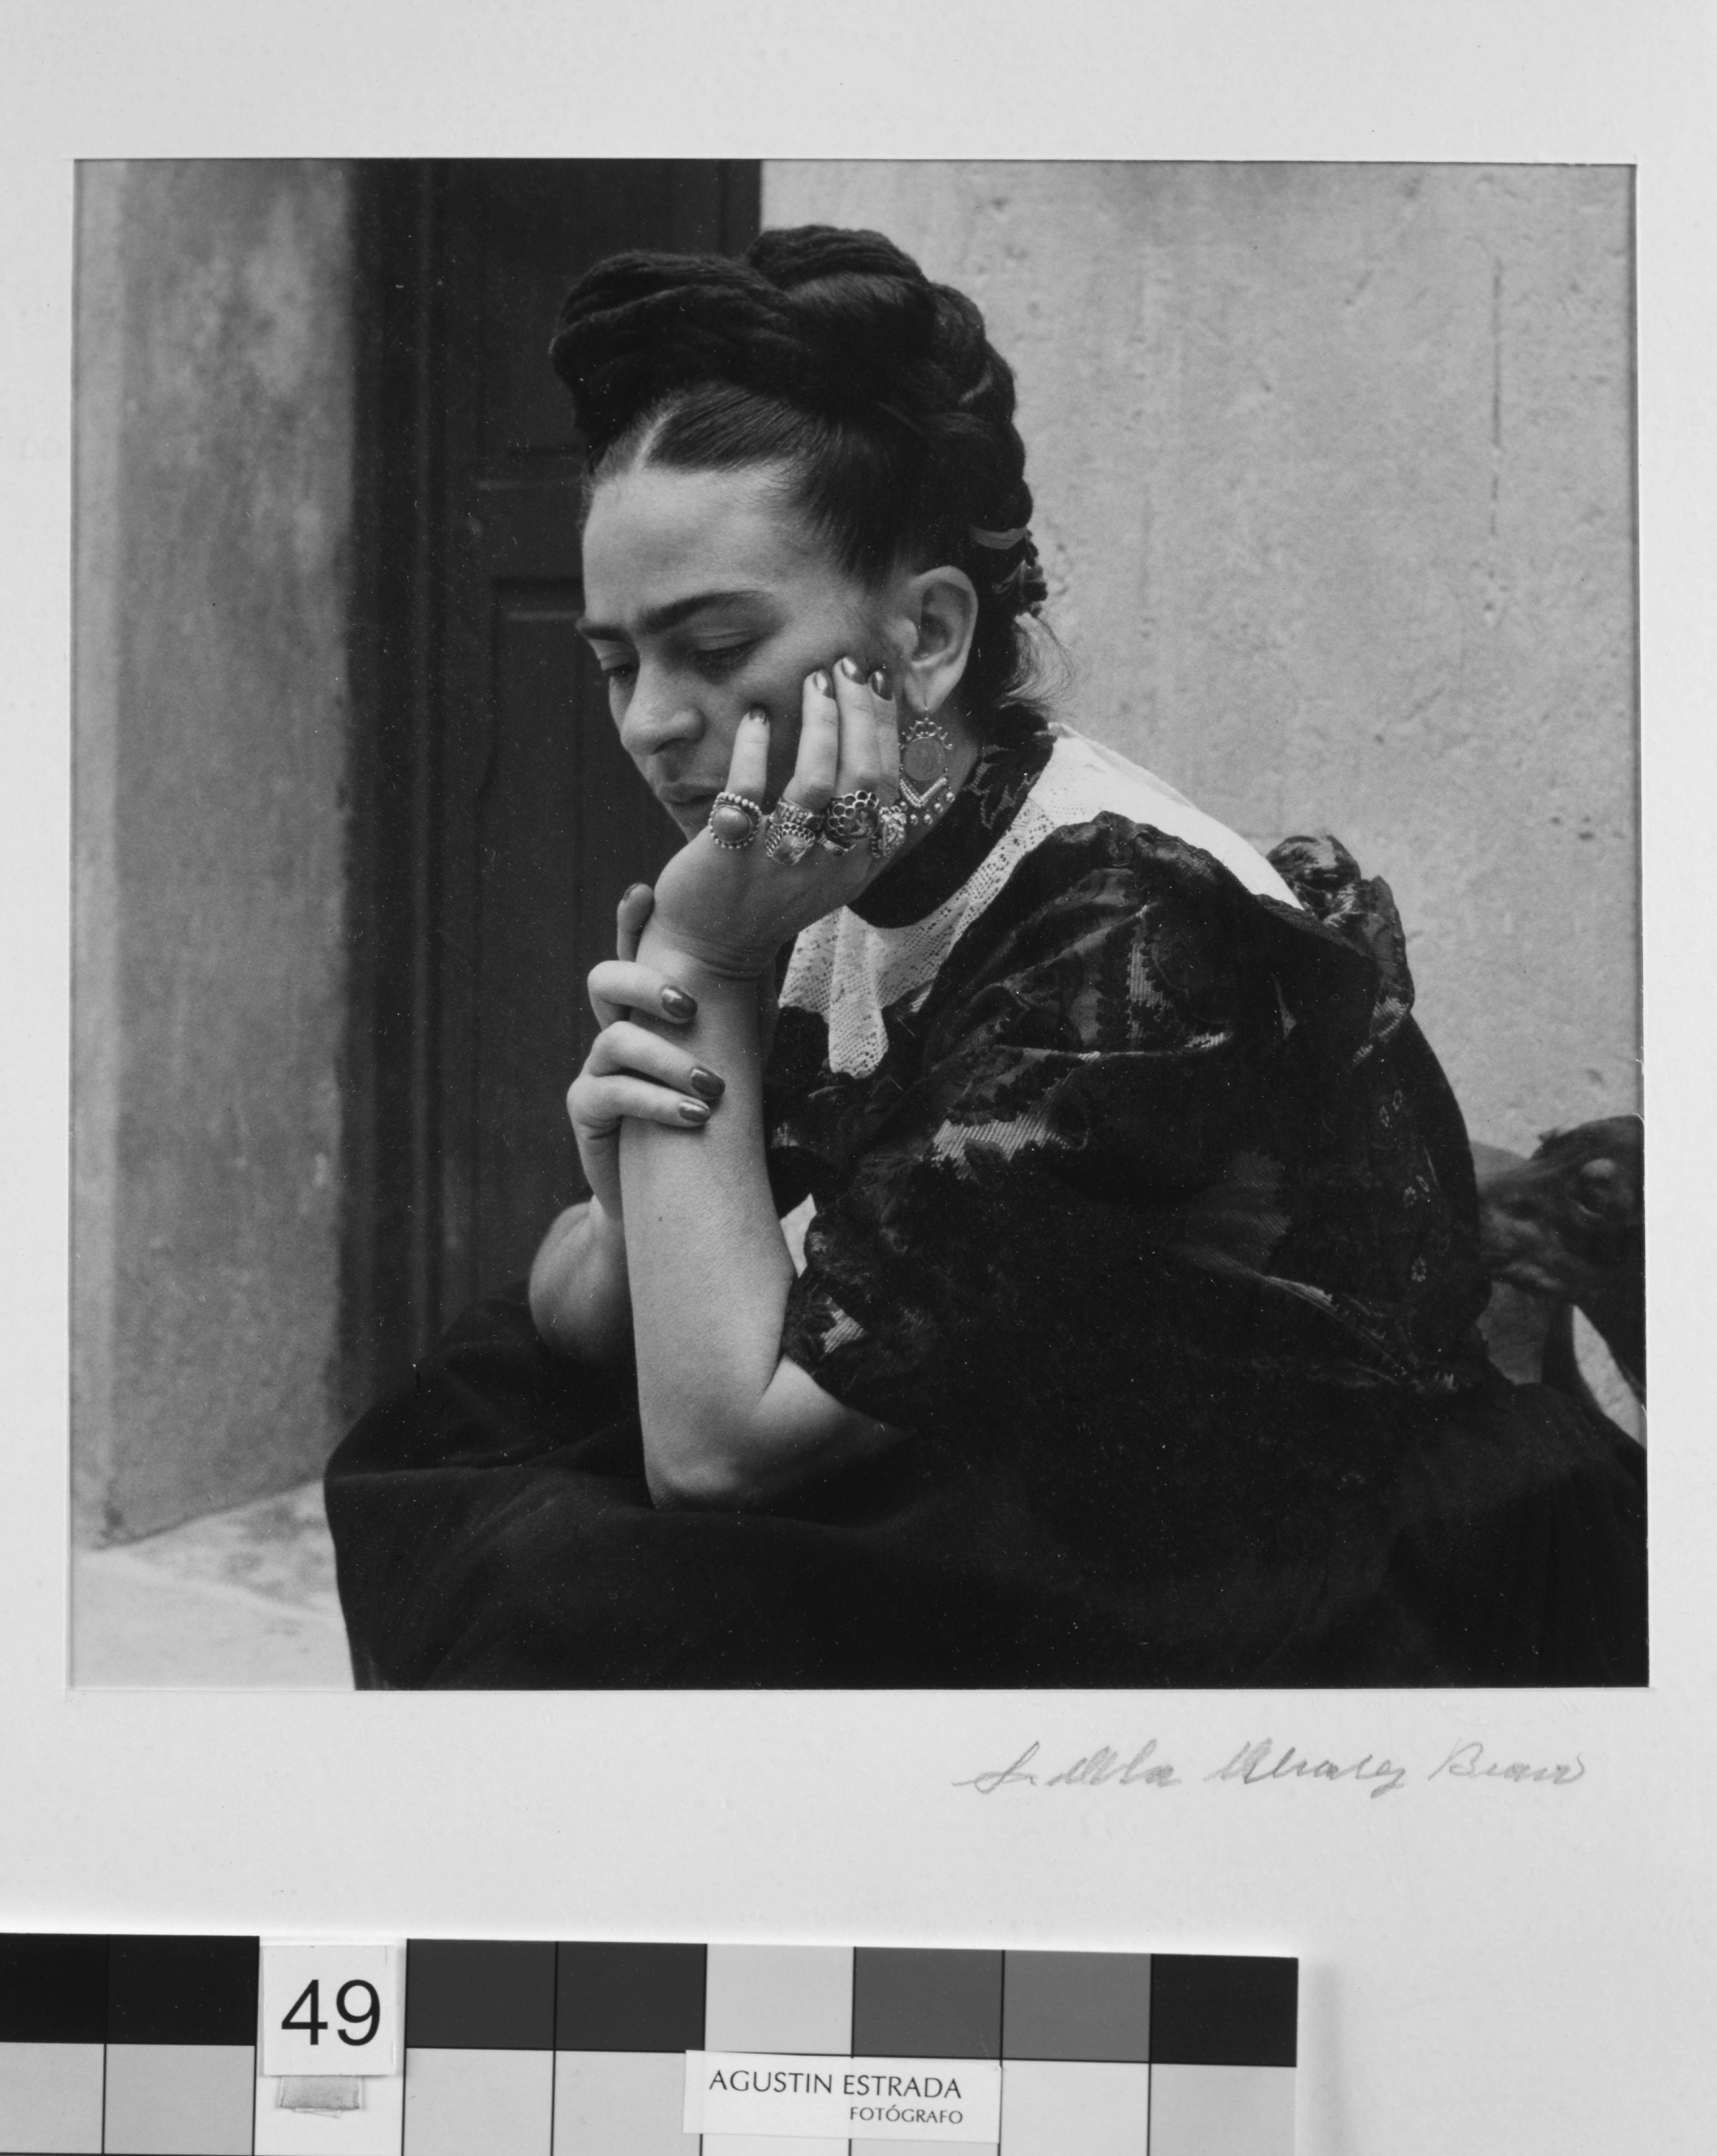 6-LolaAlvarezBravo Frida Kahlo